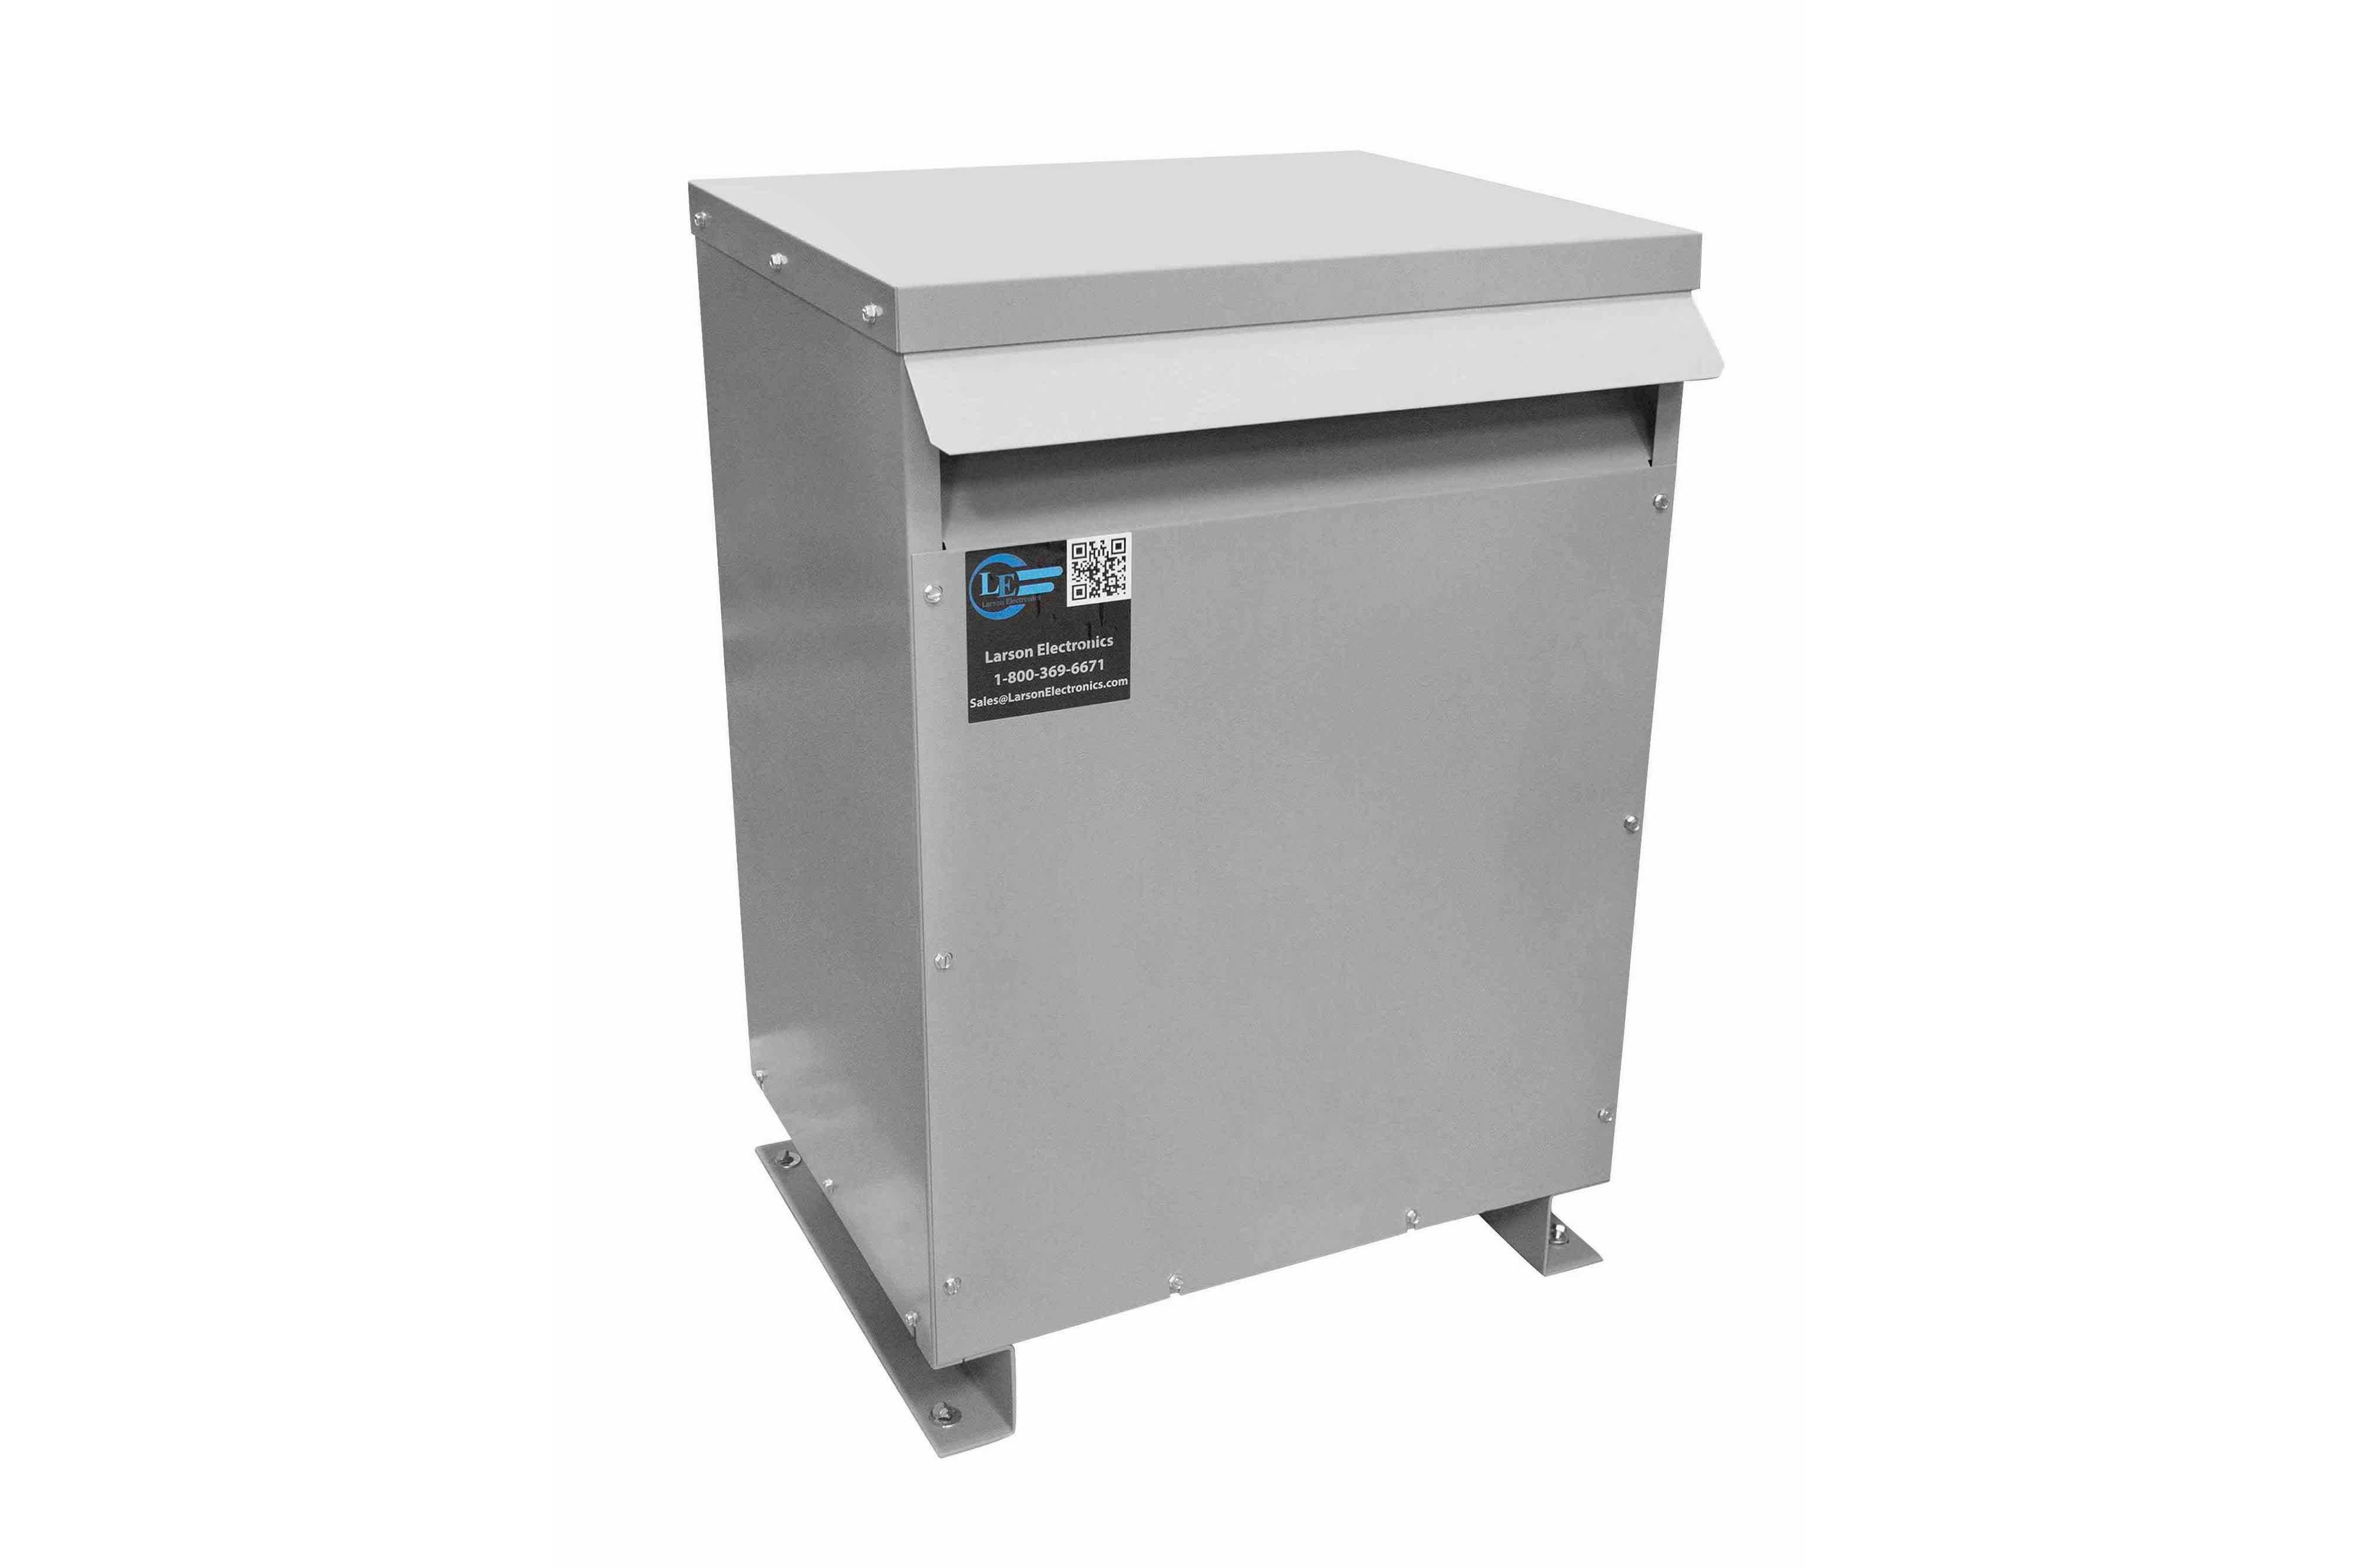 700 kVA 3PH Isolation Transformer, 575V Wye Primary, 480Y/277 Wye-N Secondary, N3R, Ventilated, 60 Hz